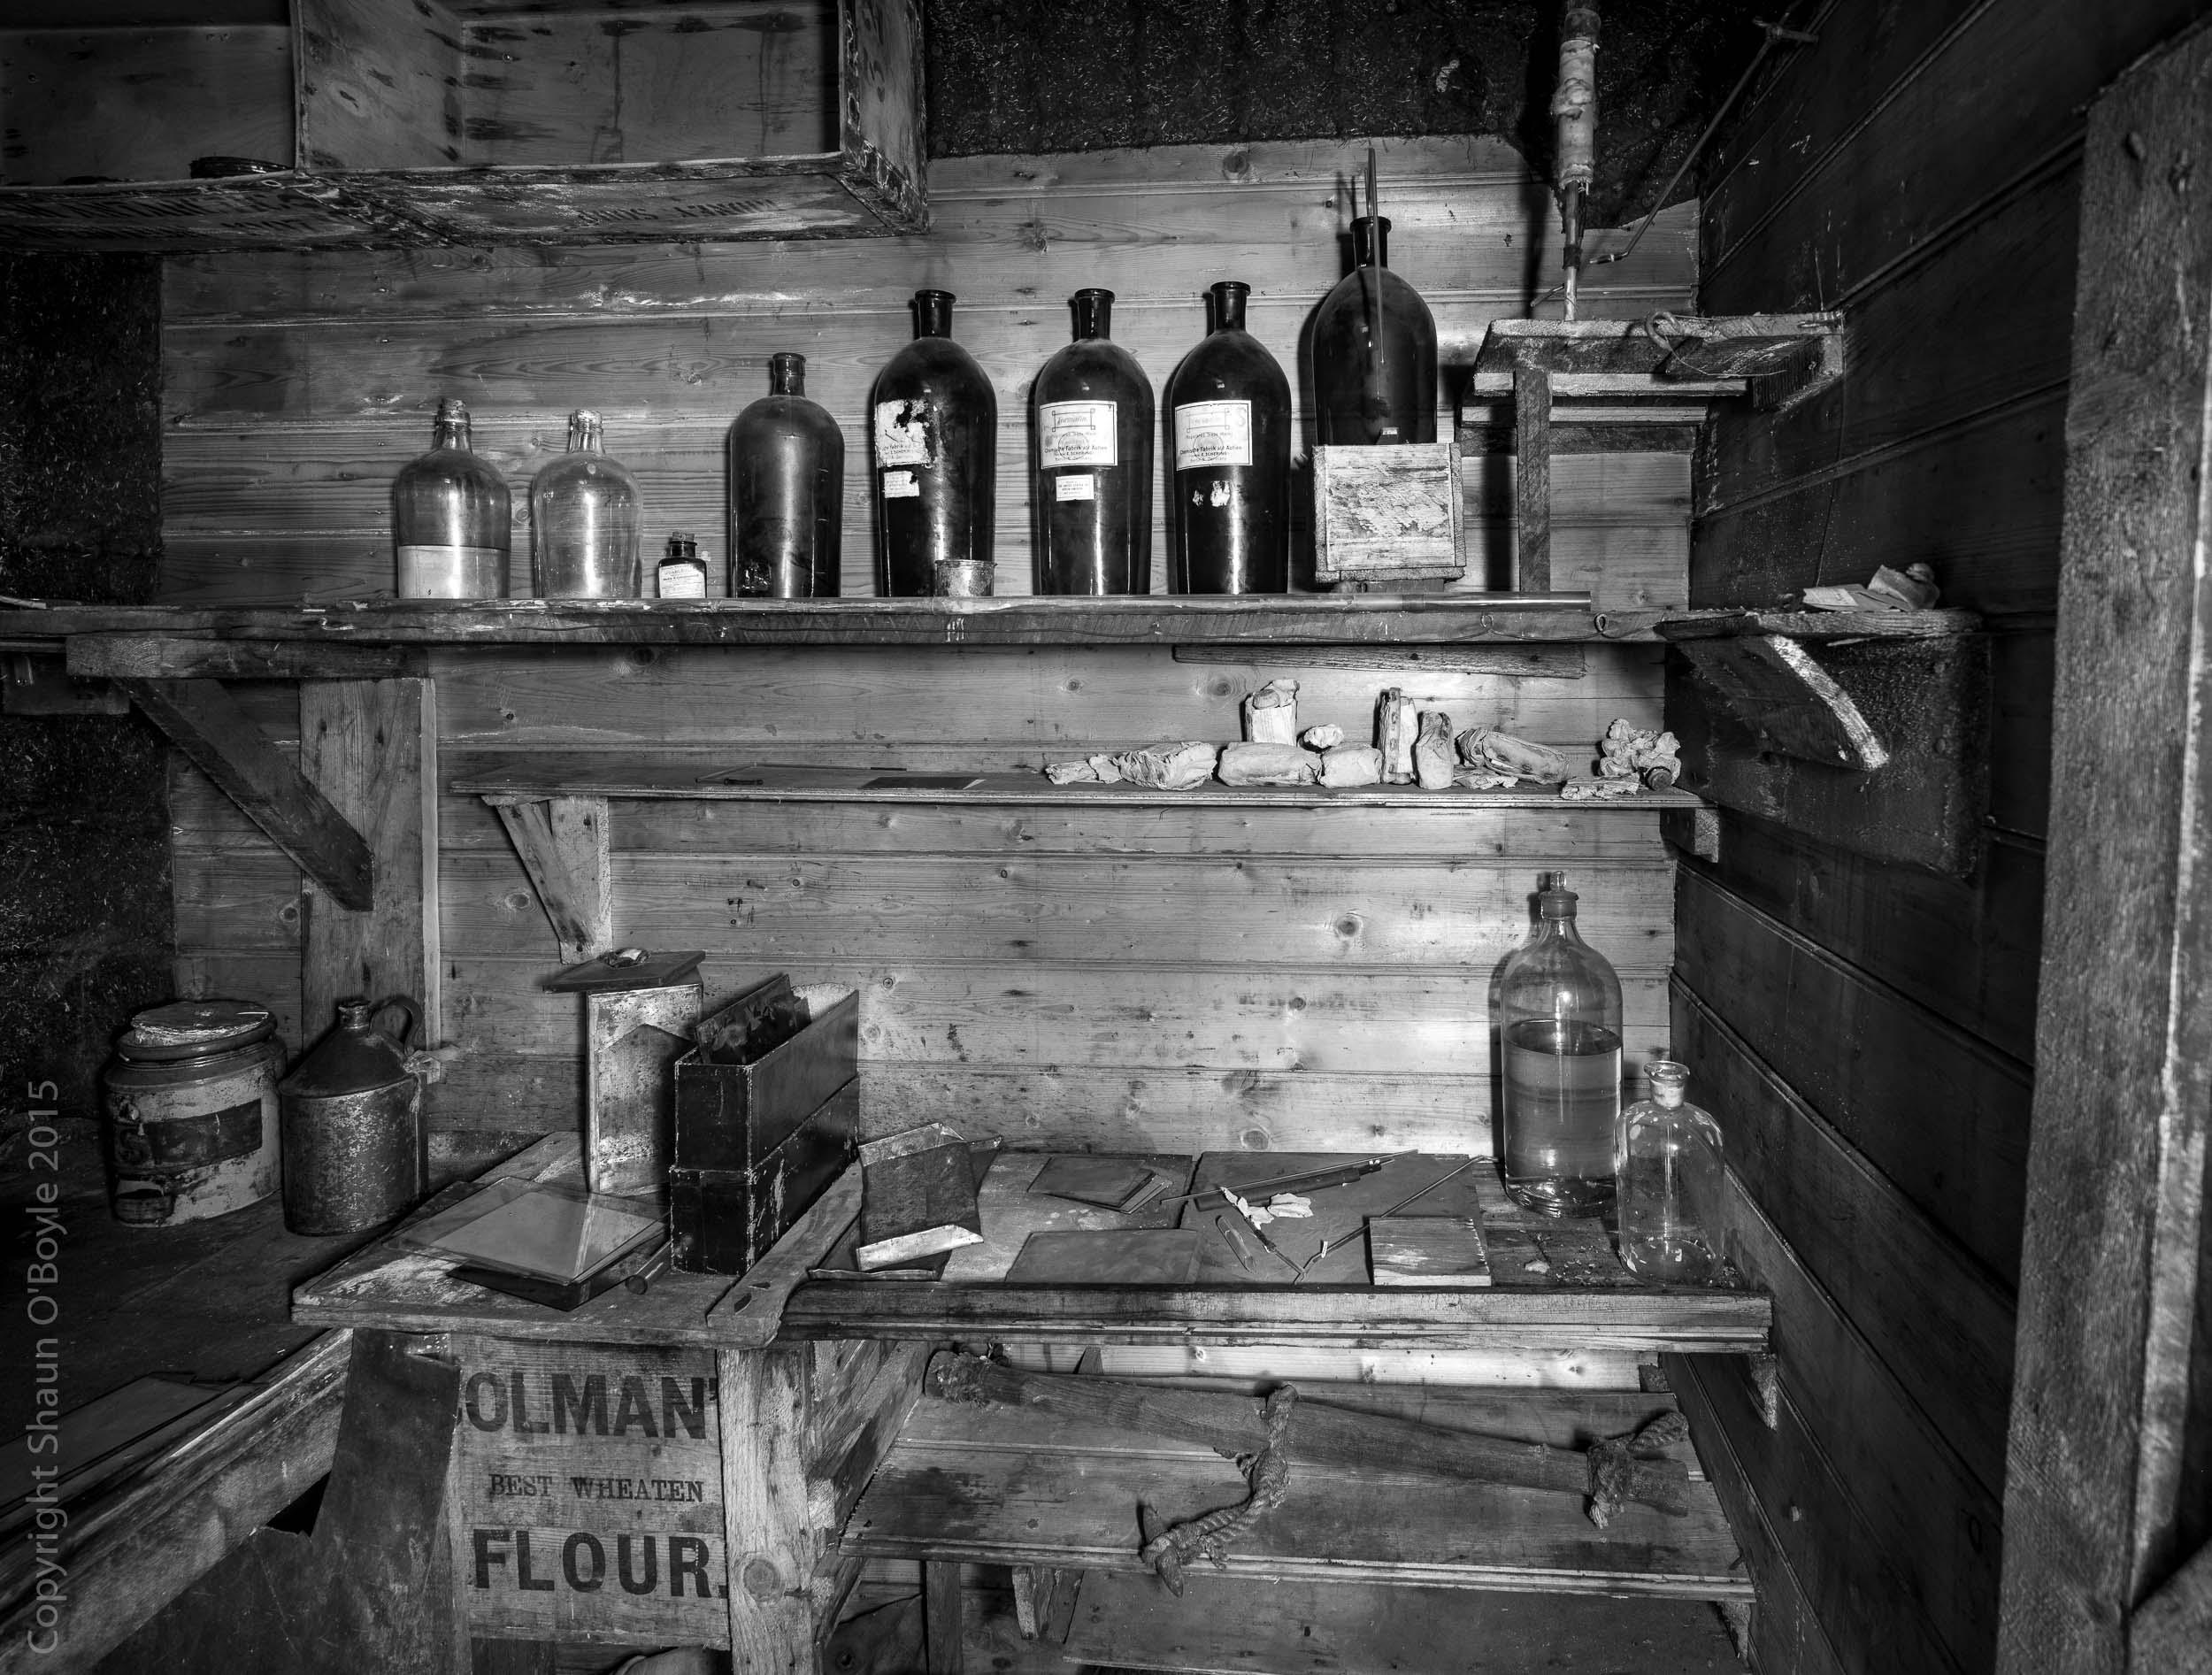 Darkroom, Shackleton's Cape Royds hut